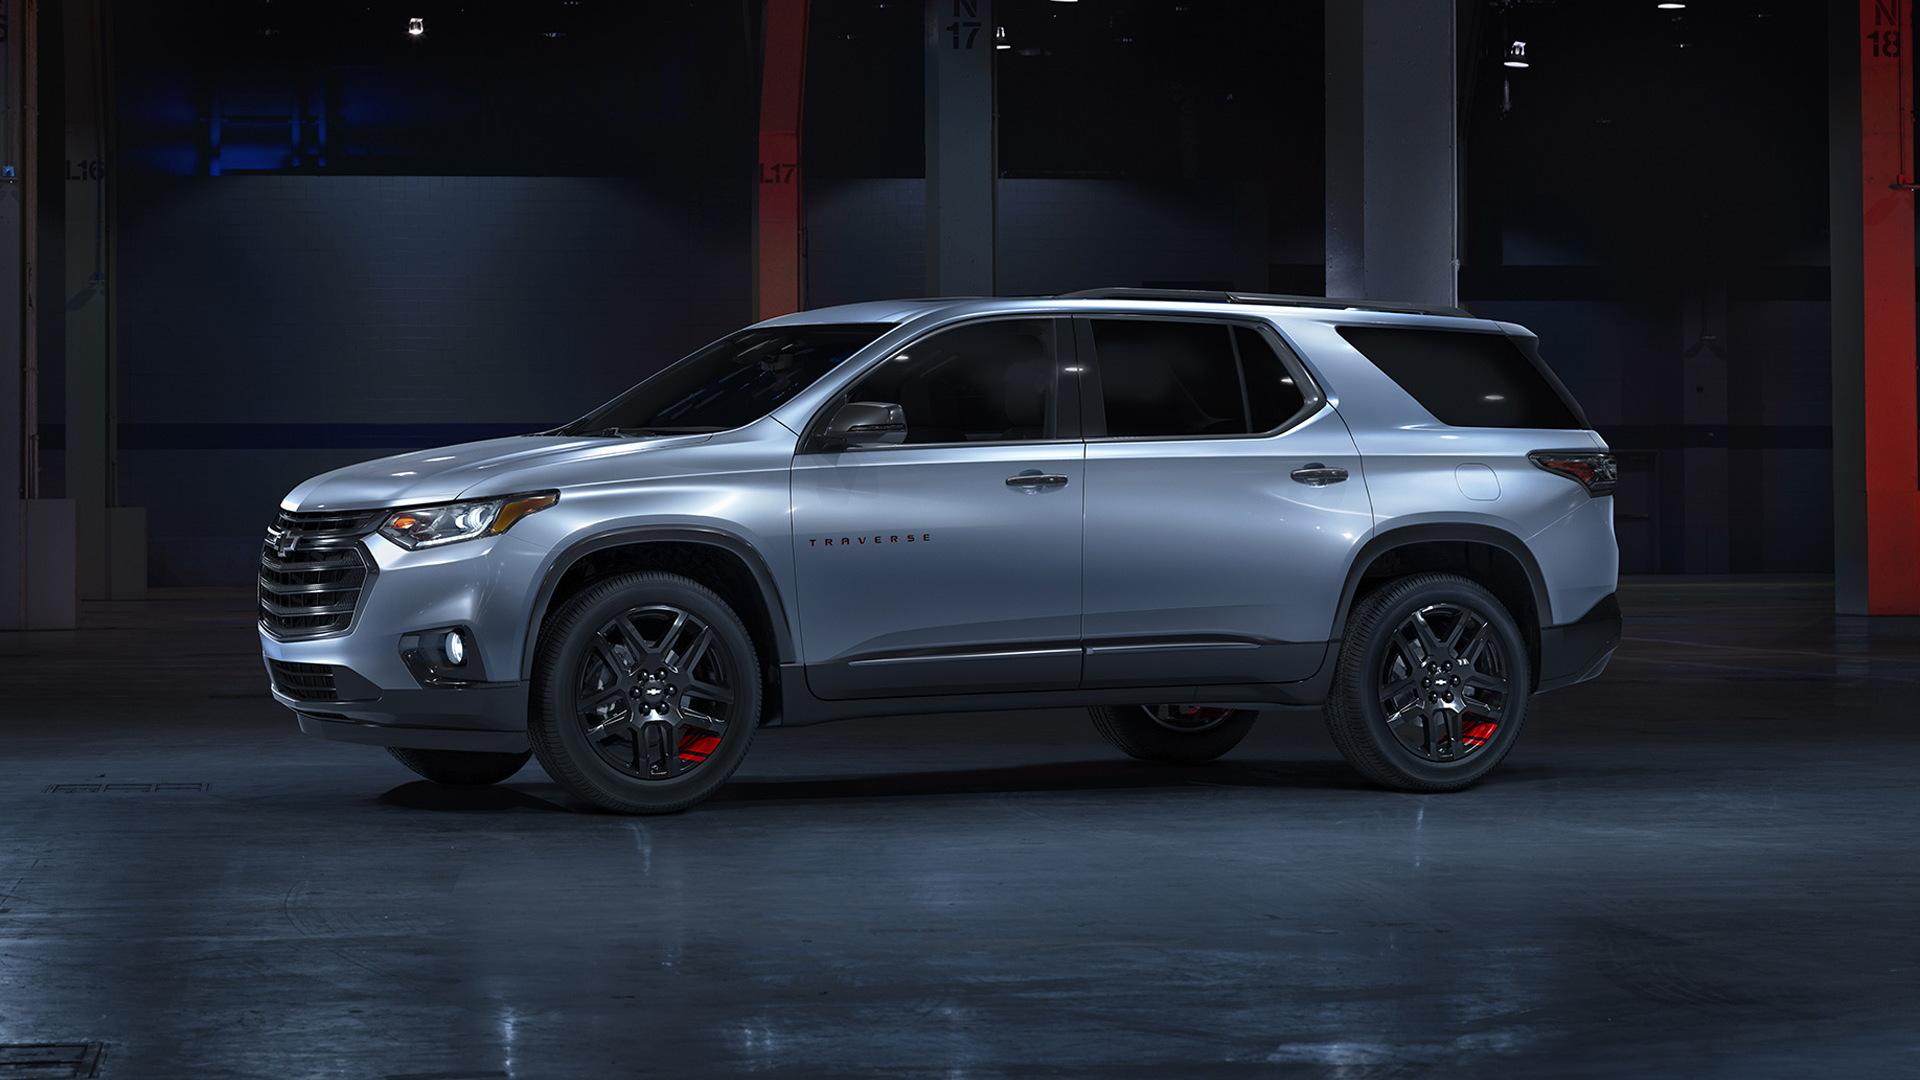 2018 Chevrolet Traverse Redline